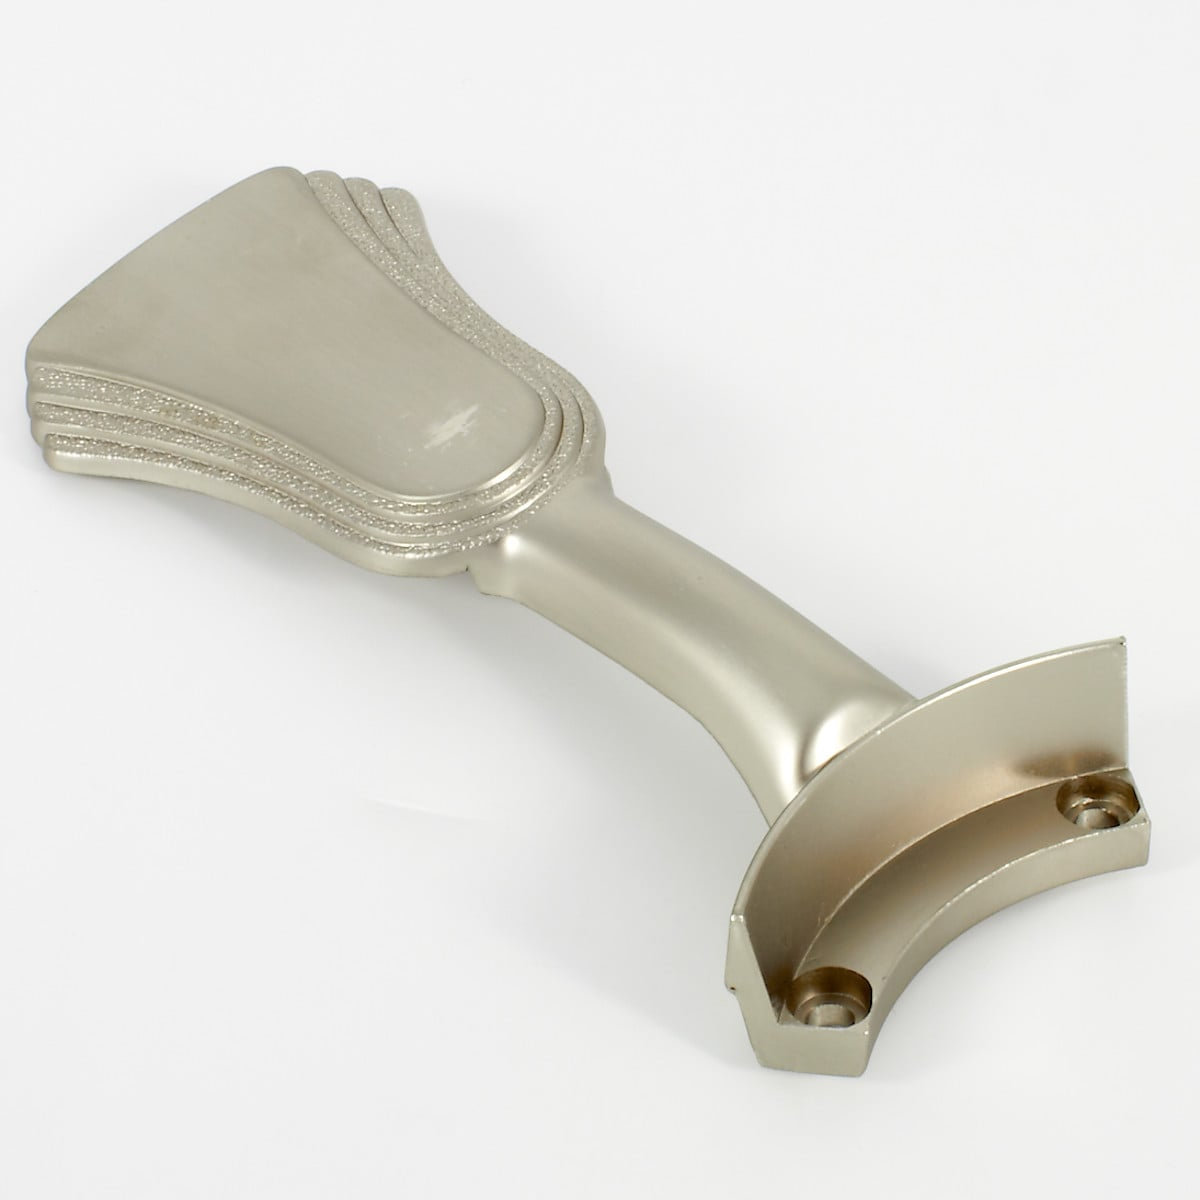 Bladholder Cottex Borstad stål